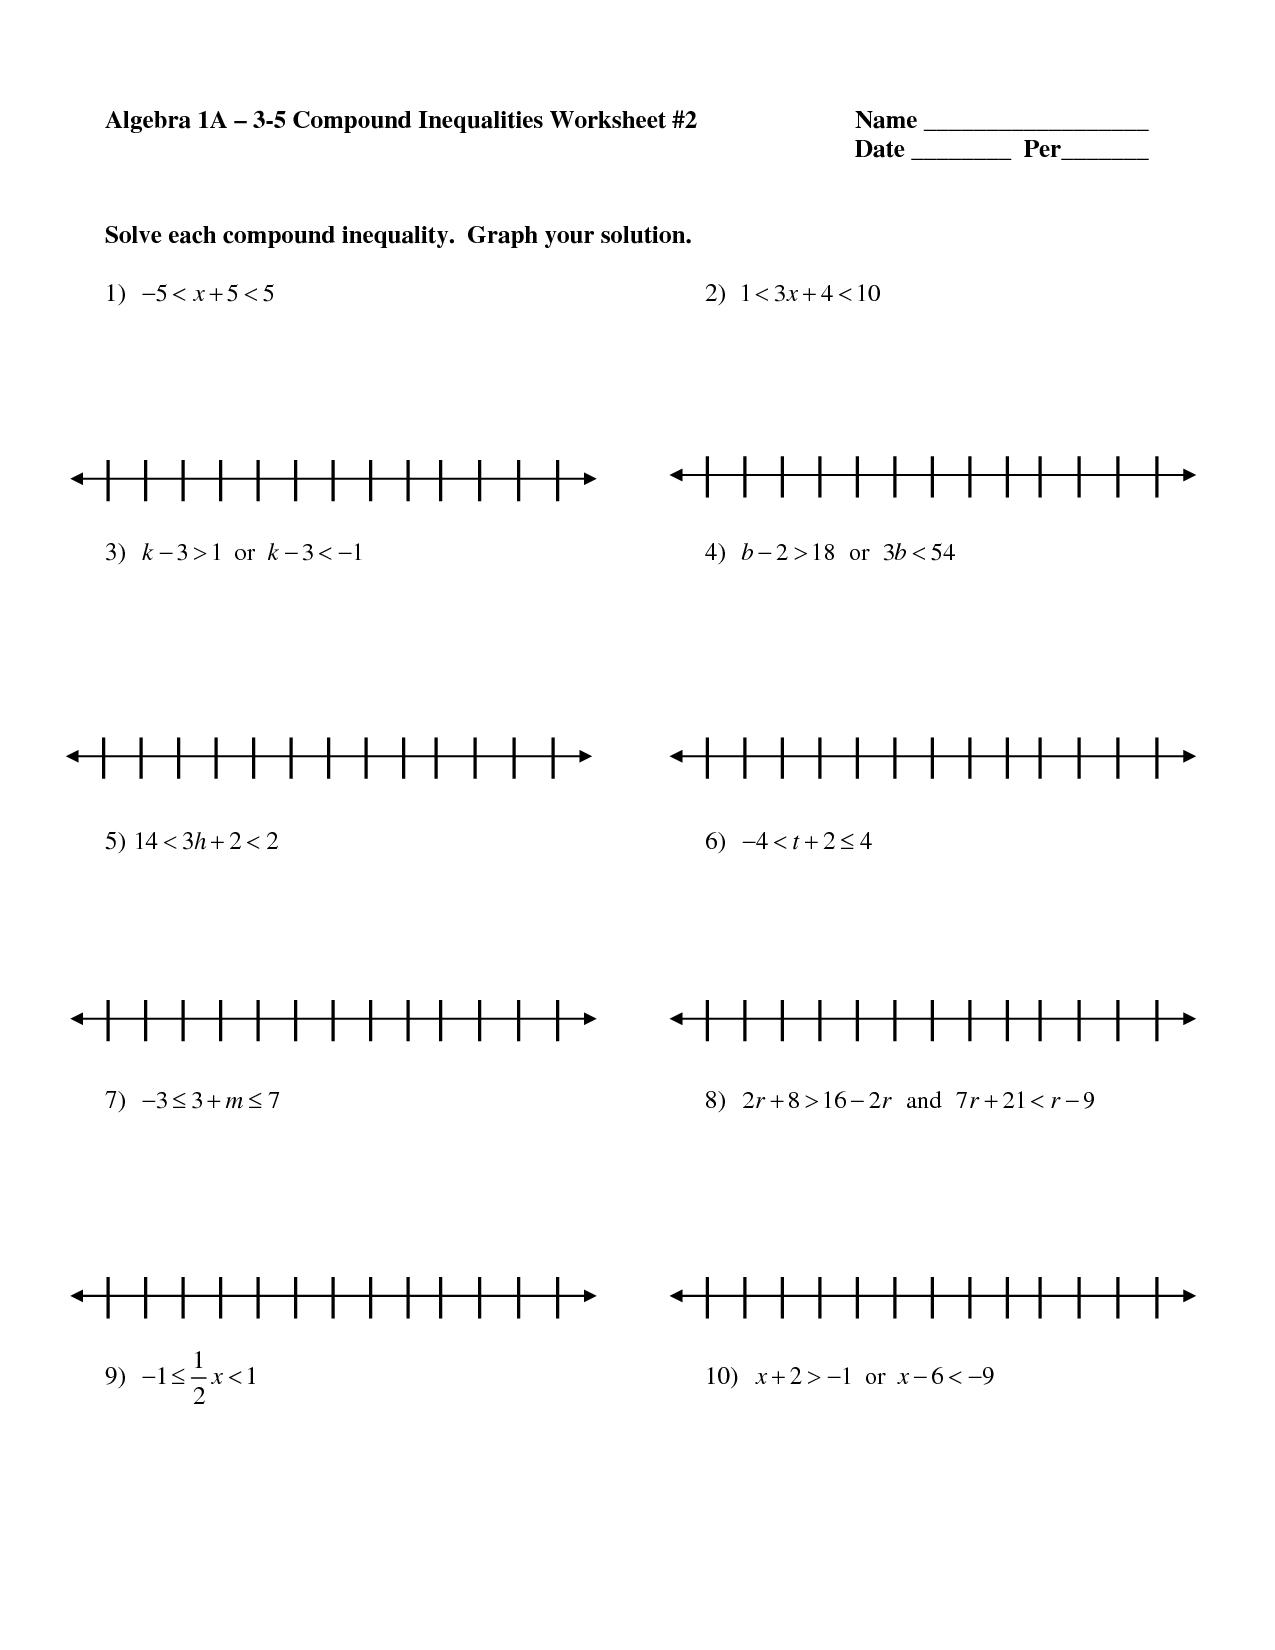 Compound Inequalities Worksheet Algebra 1